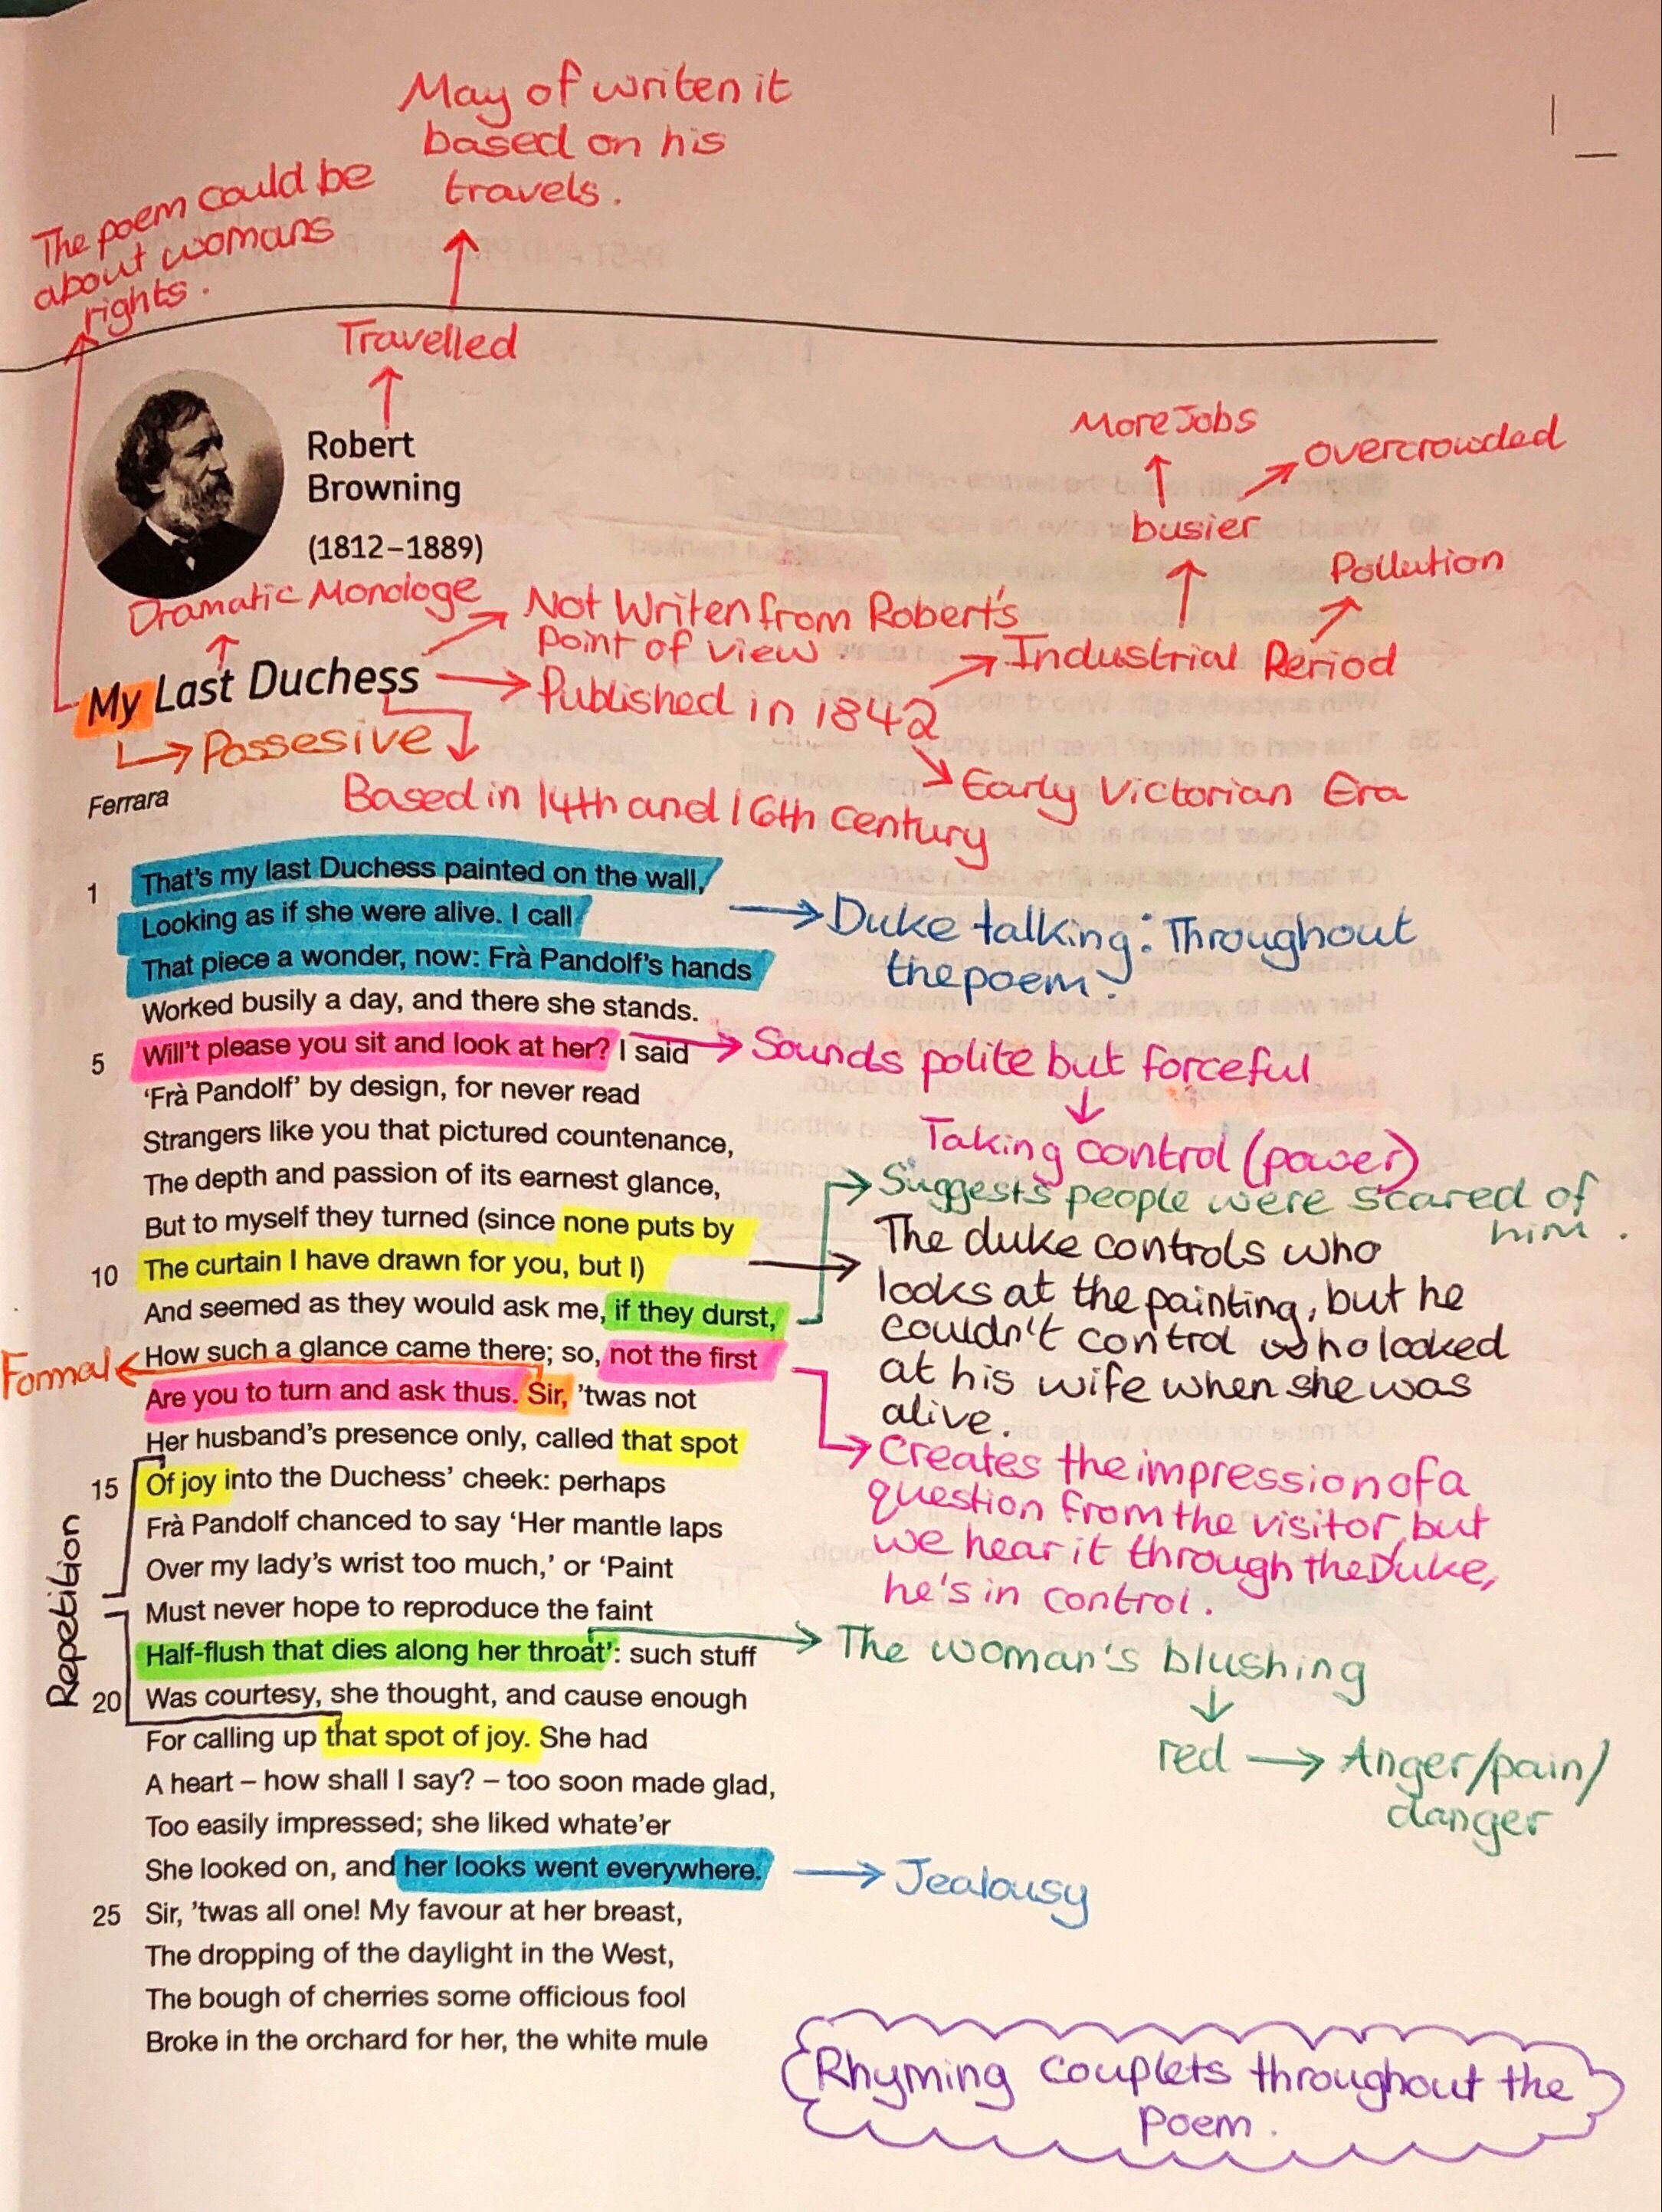 My Last Duches Analysi Gcse English Literature Poem Analysis Line By